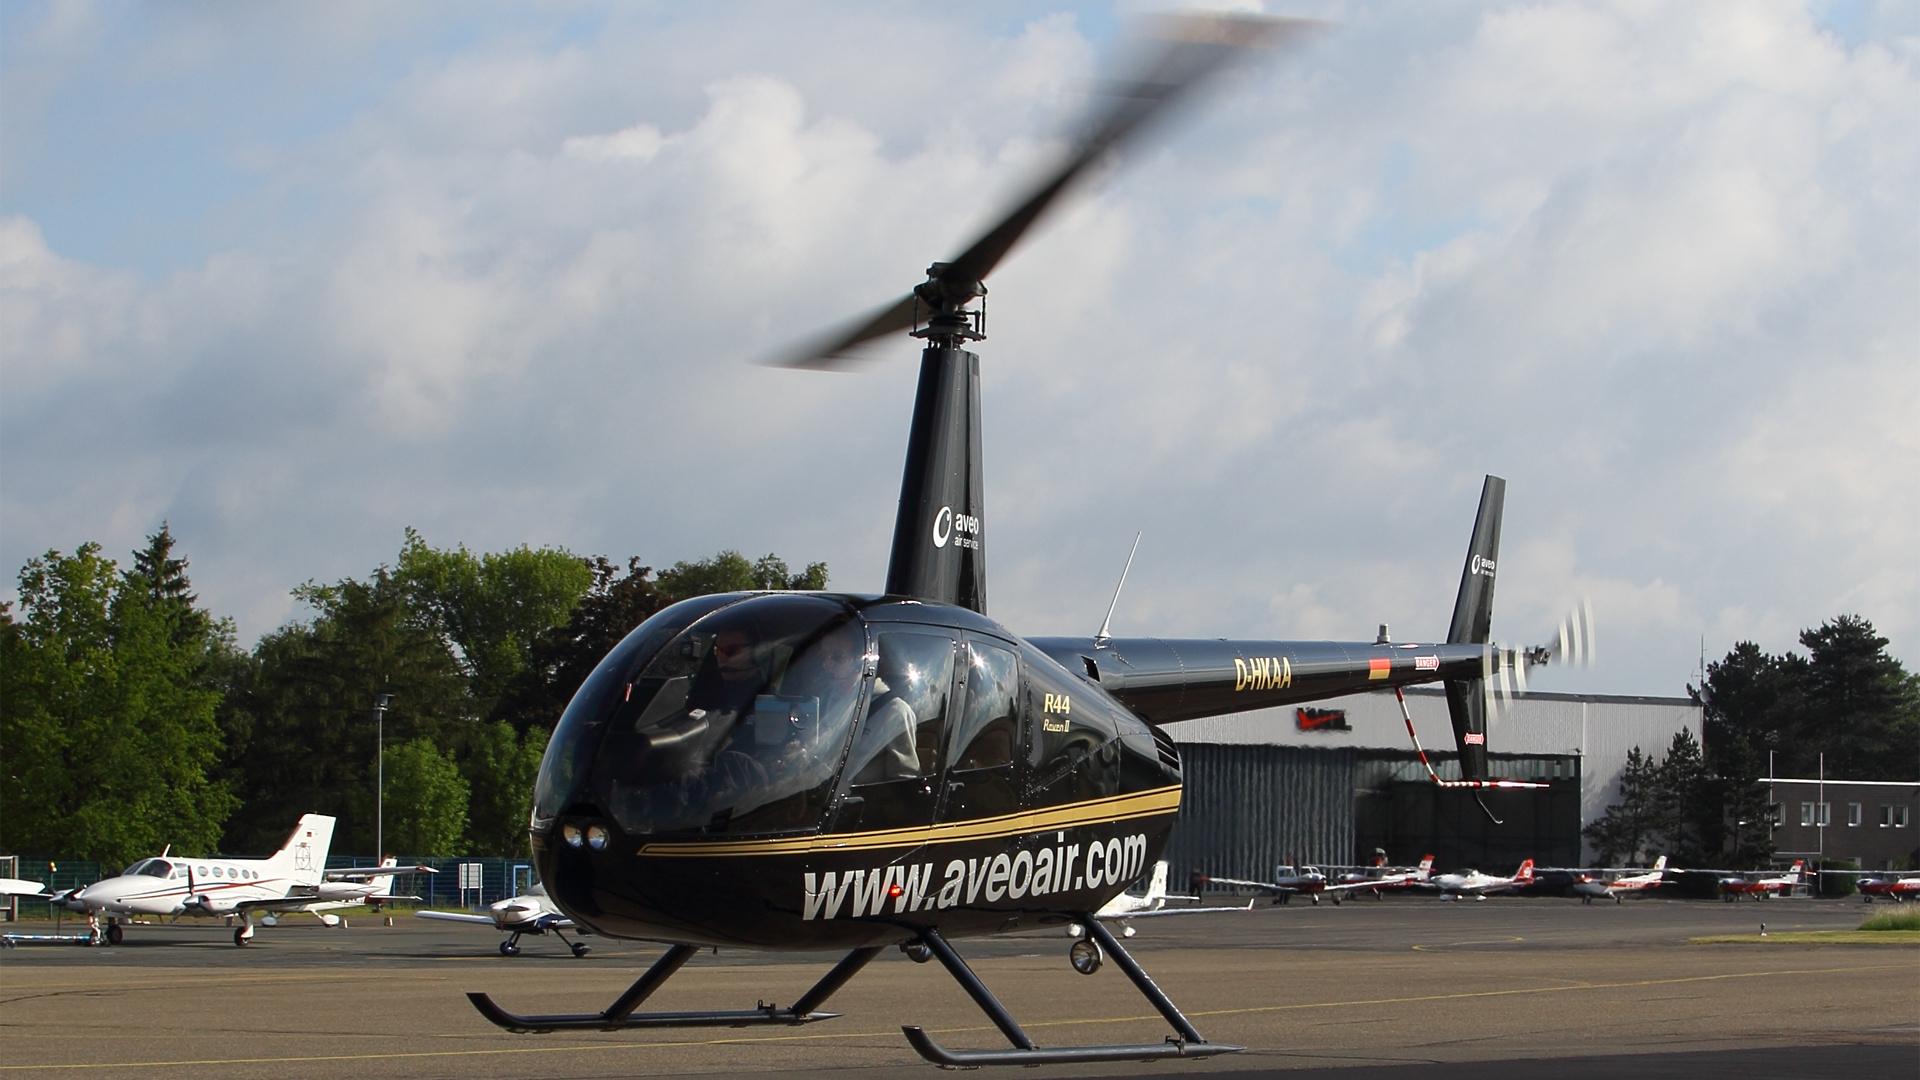 D-HHKA-1 R44 ESS 201505